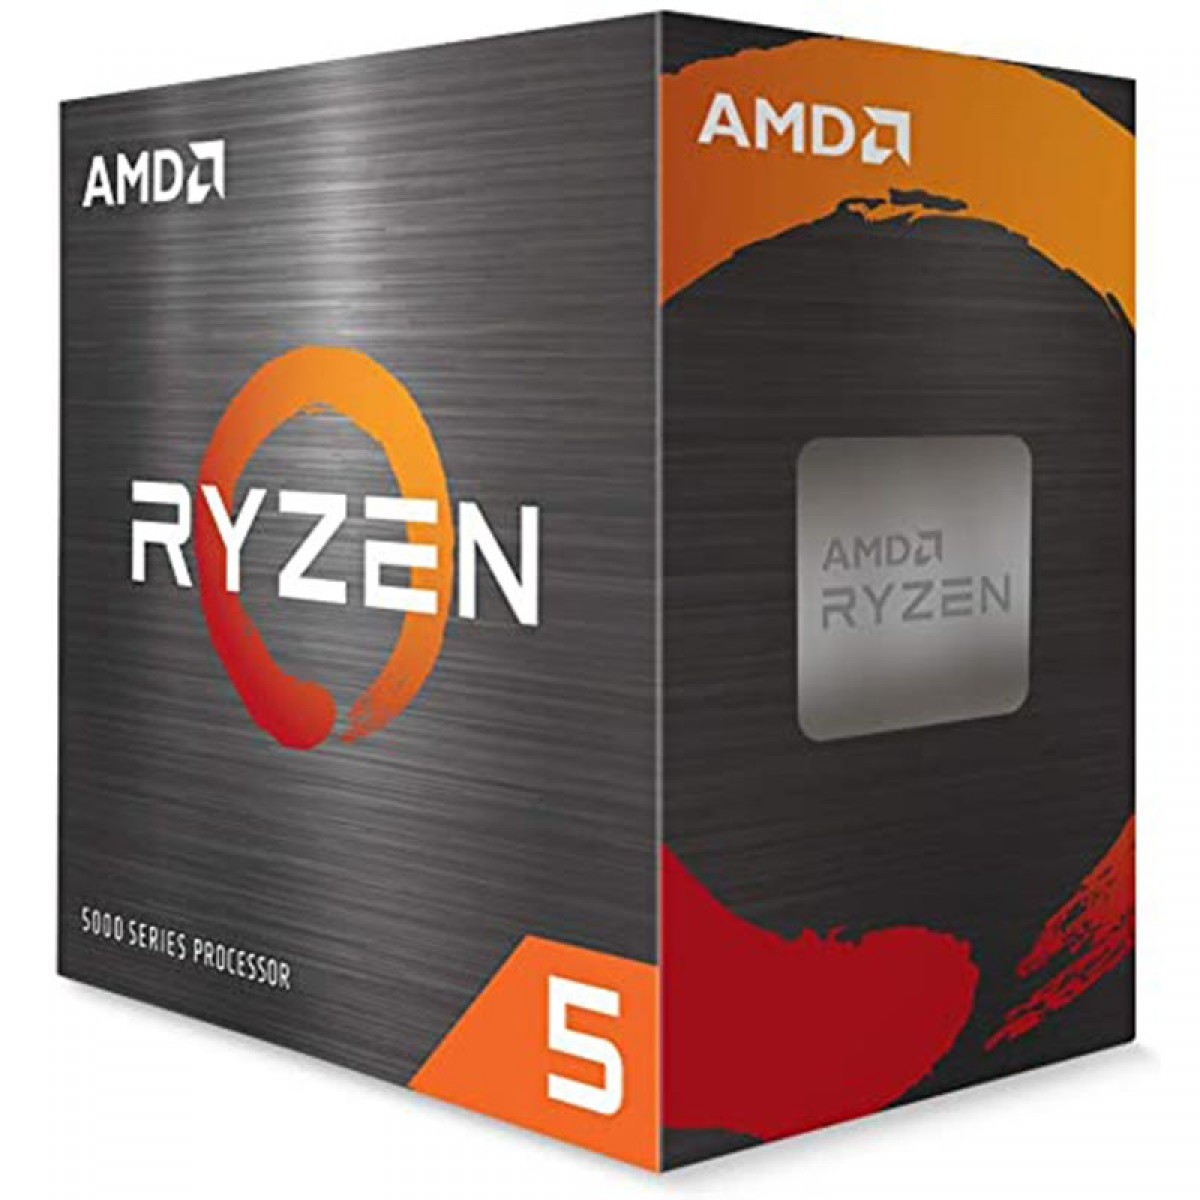 Kit Upgrade, AsRock A520M-HDV + AMD Ryzen 5 5600G + Memória DDR4, 16GB 3000MHz